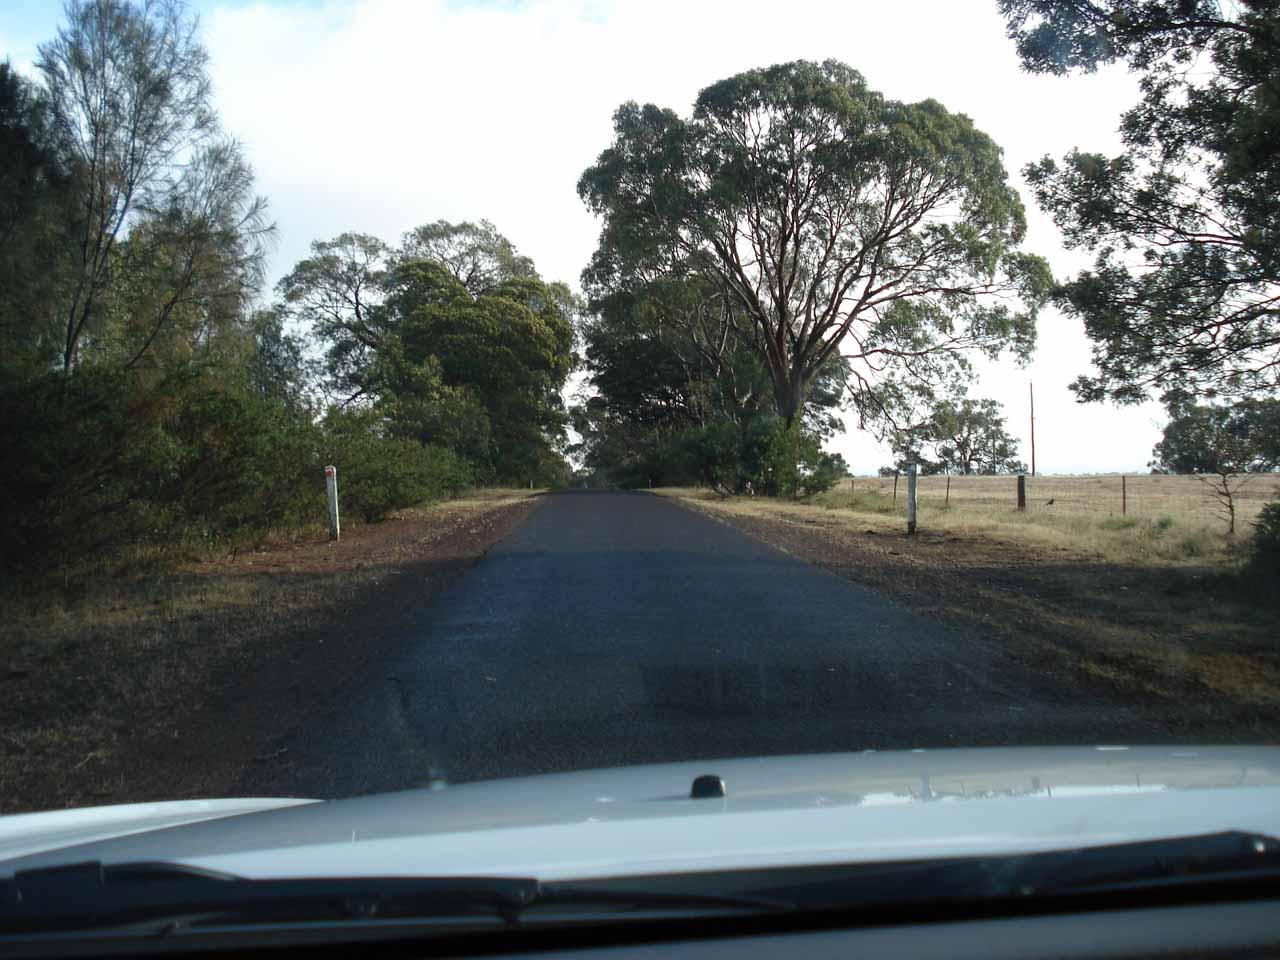 On the Wannon-Nigretta Falls Road bound for Nigretta Falls after visiting Wannon Falls